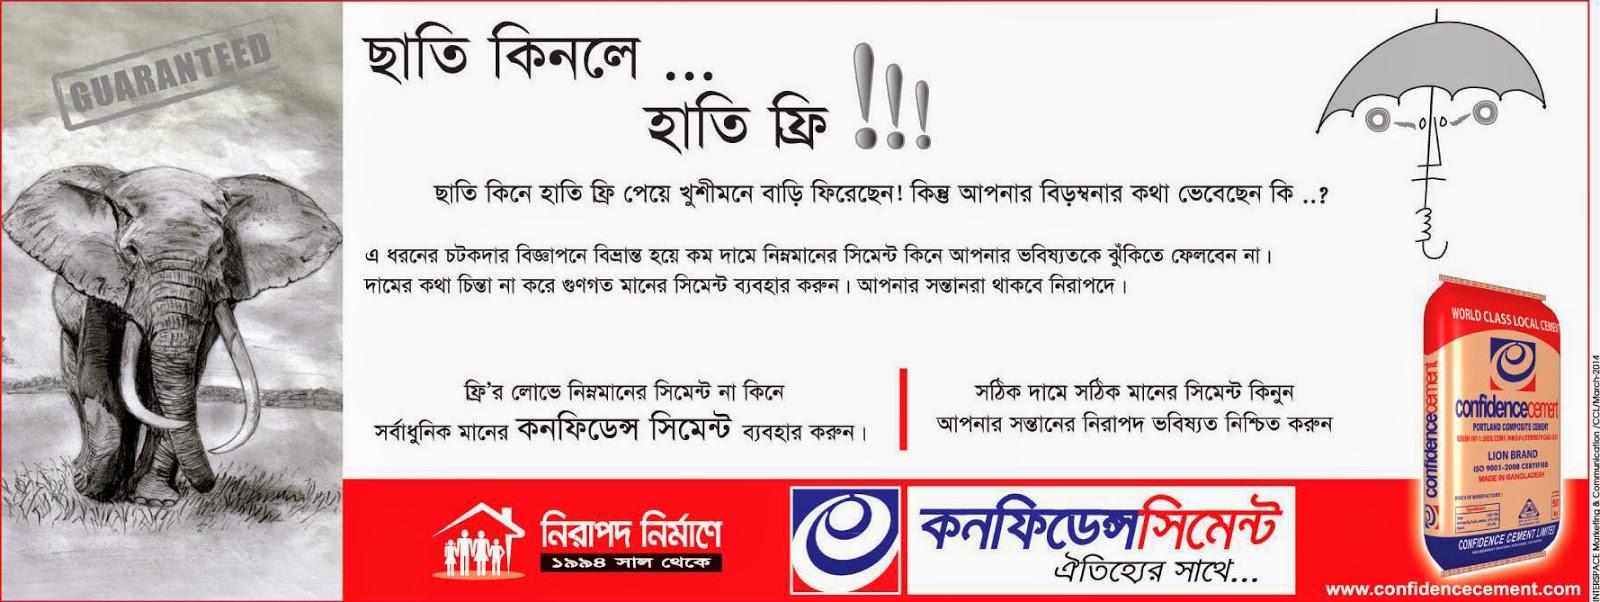 Advertising Archive Bangladesh: Mar 8, 2014